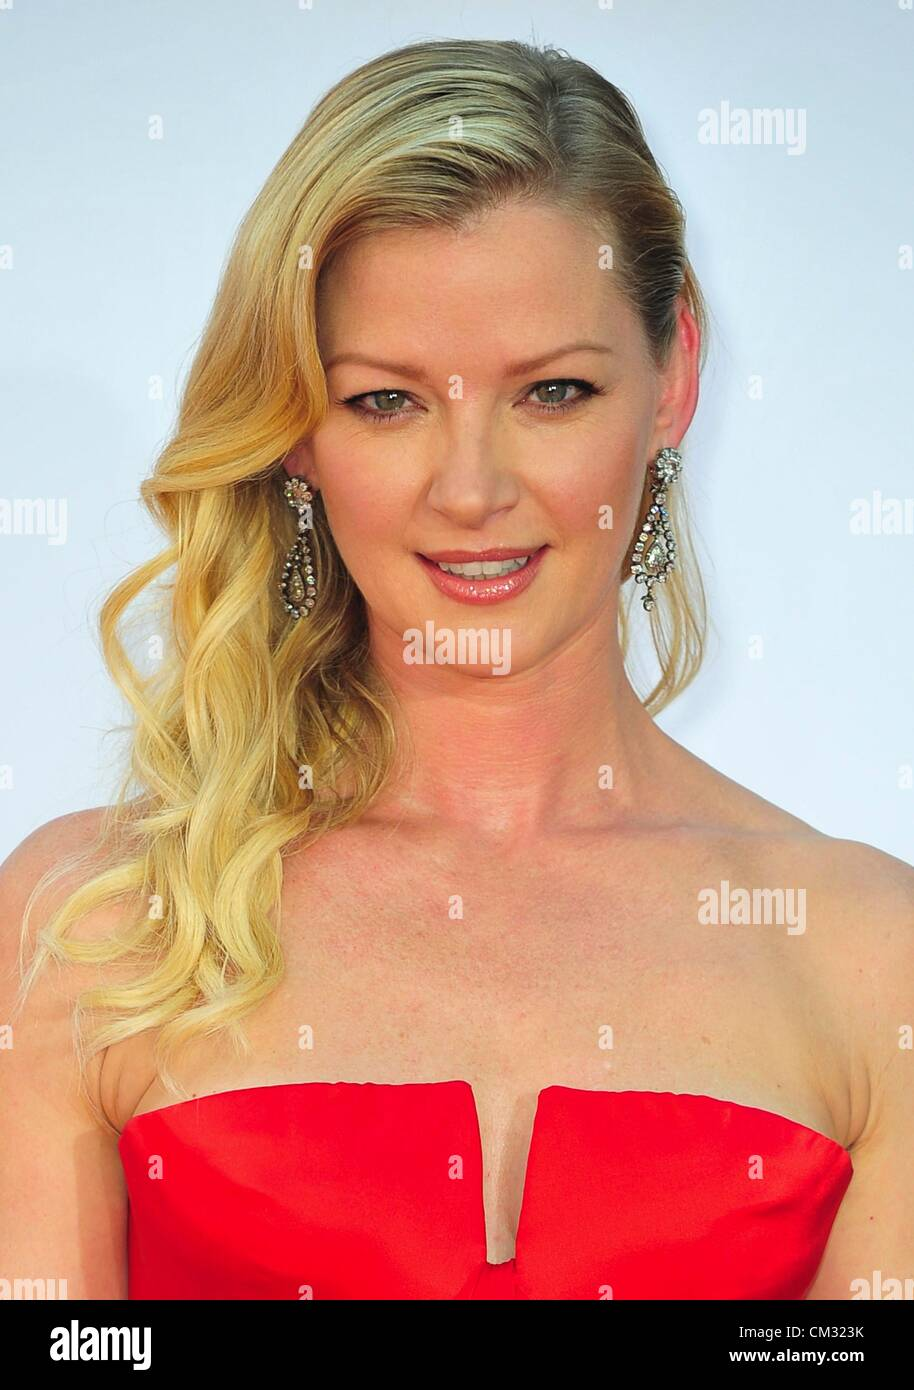 Gretchen Moll arrivals64th Primetime Emmy Awards - ARRIVALS Nokia Theatre L.A LIVE Los Angeles CA September 23 2012 Stock Photo